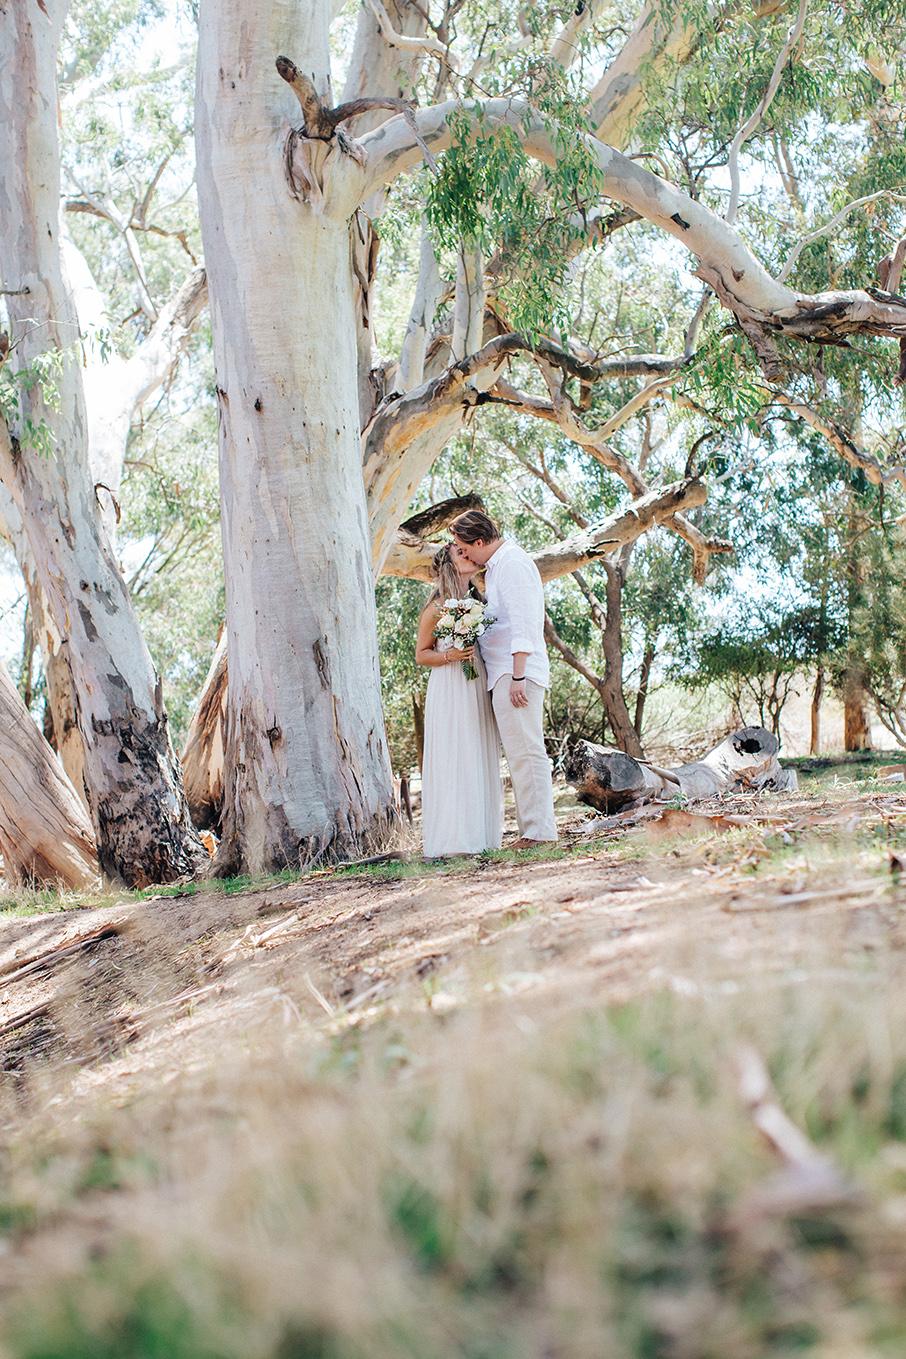 Bohemian McLaren Vale Chaff Shed Wedding 42.jpg